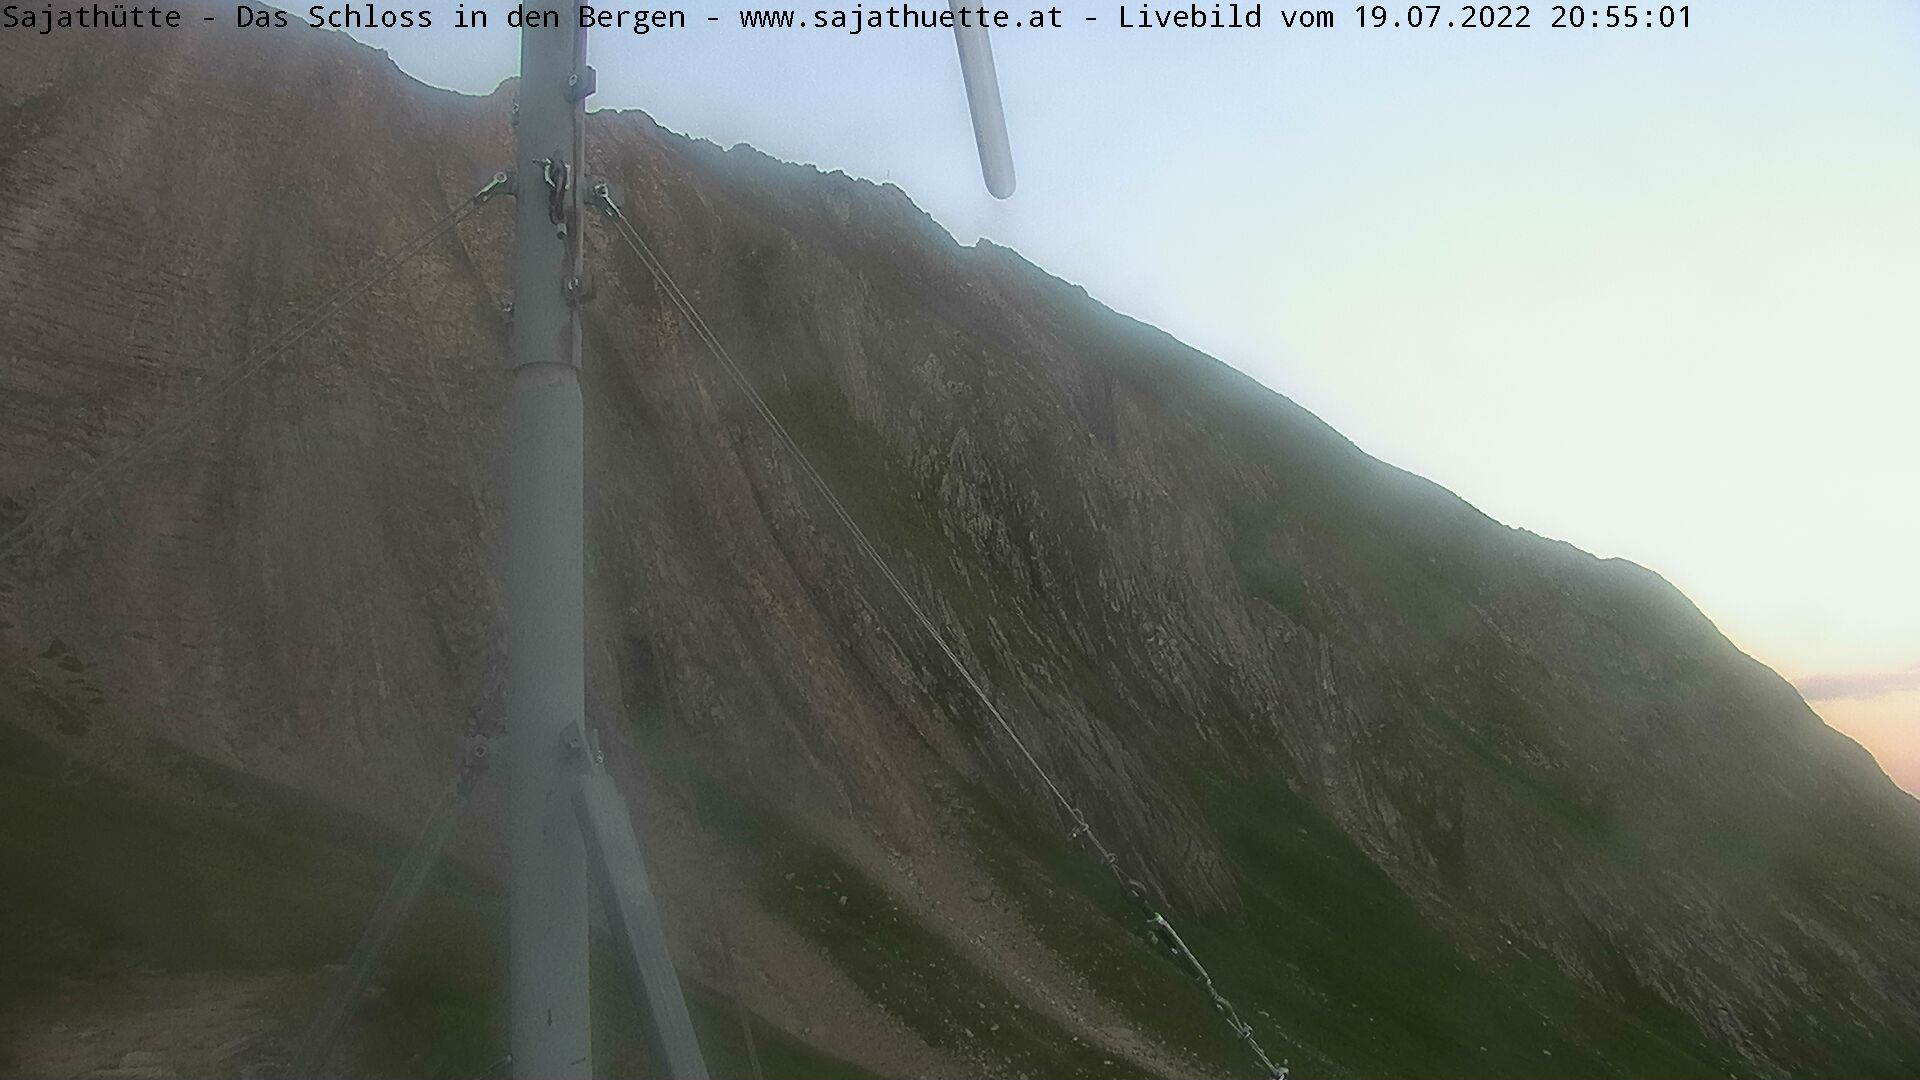 Webcam Webcam Sajathütte  | Aktuelles Live-Bild Lasörlinggruppe